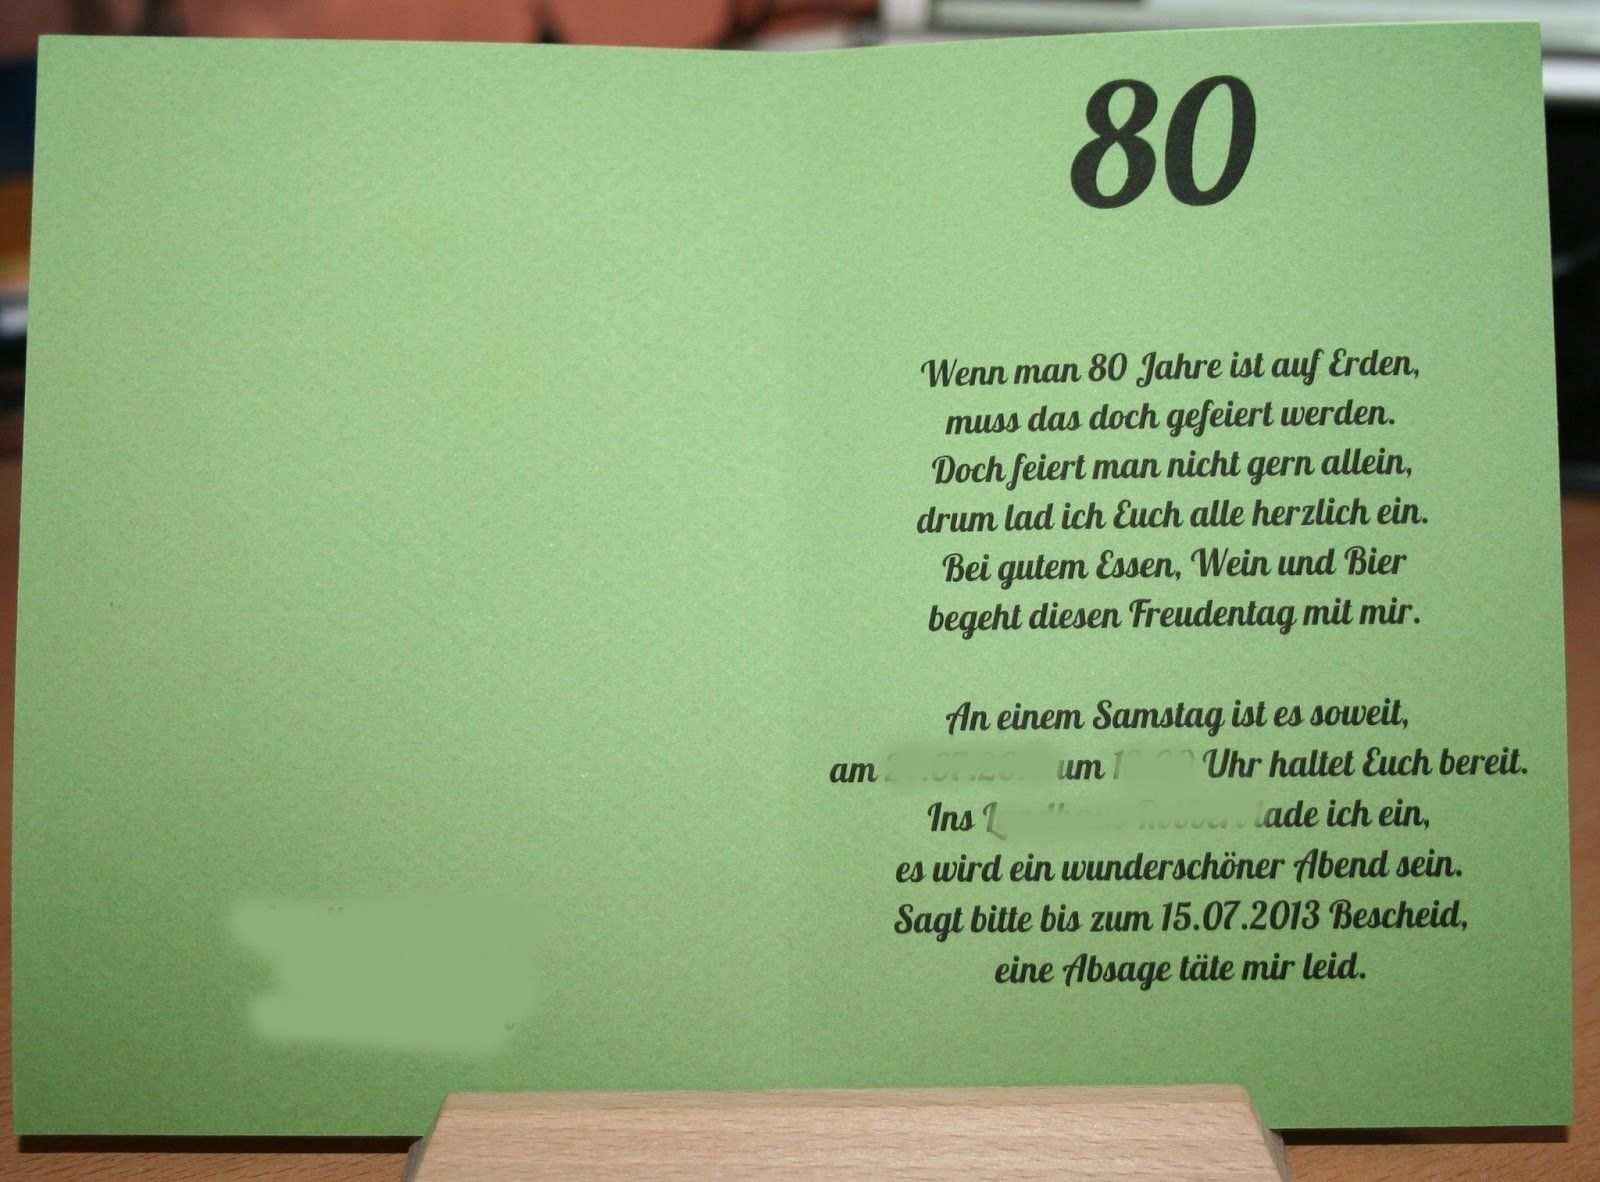 Einladung 80 Geburtstag Einladung Geburtstag Text Einladung 80